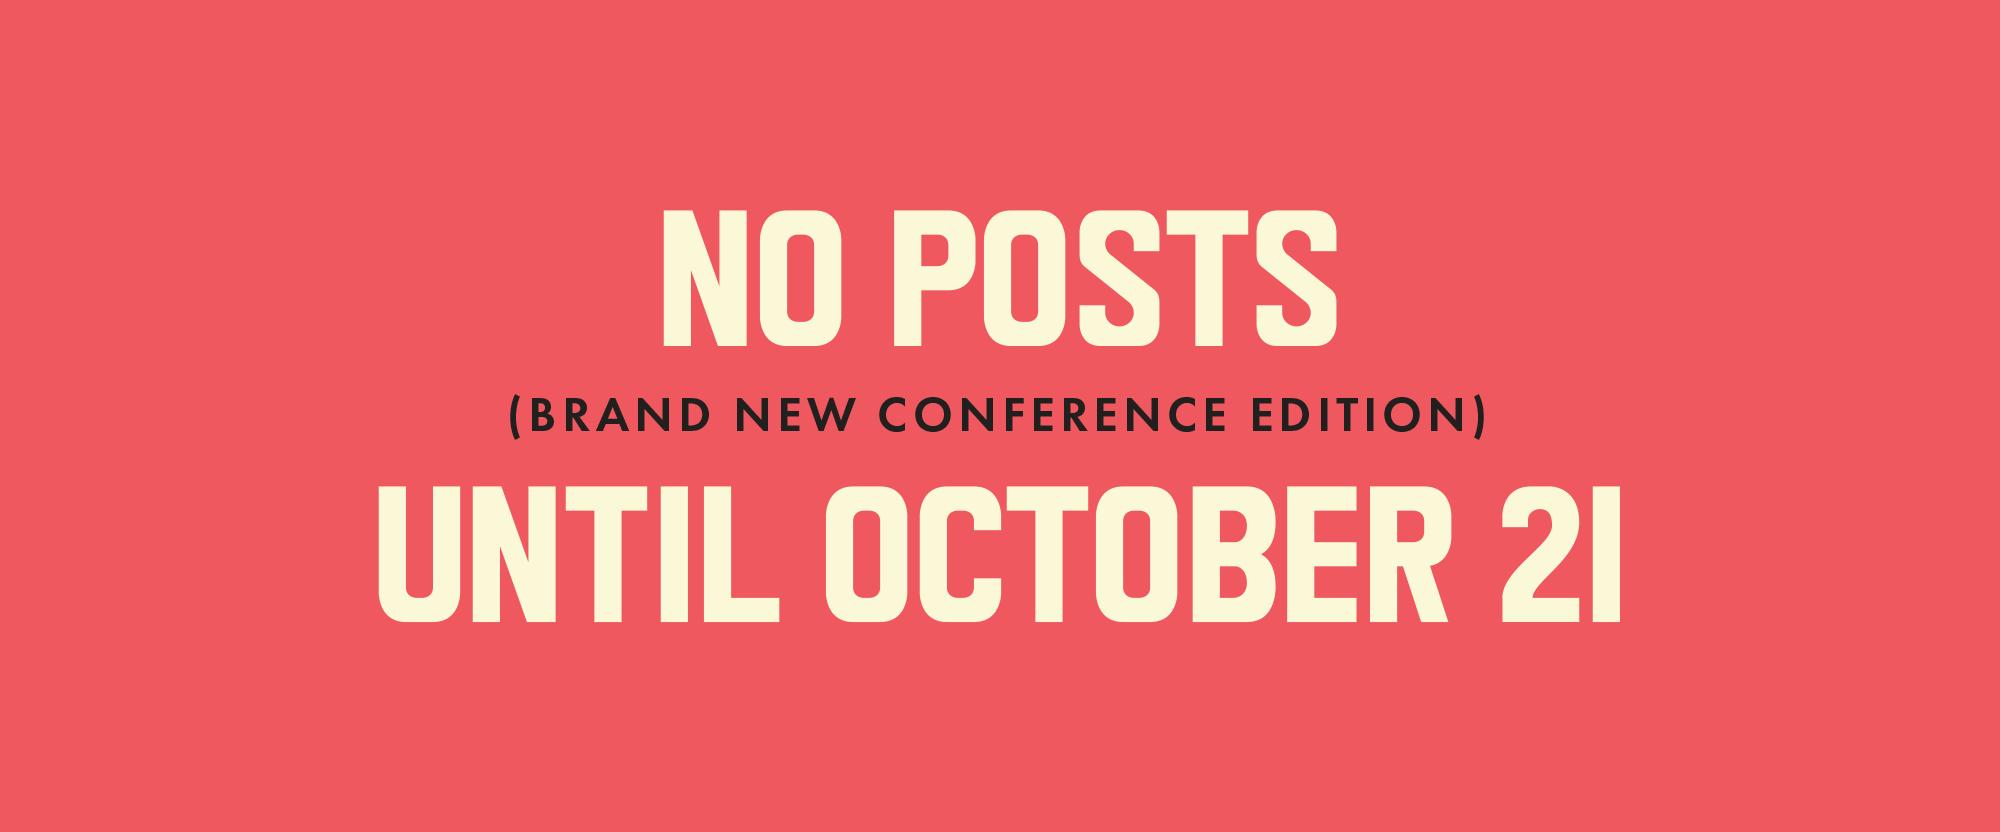 No Posts Until October 21